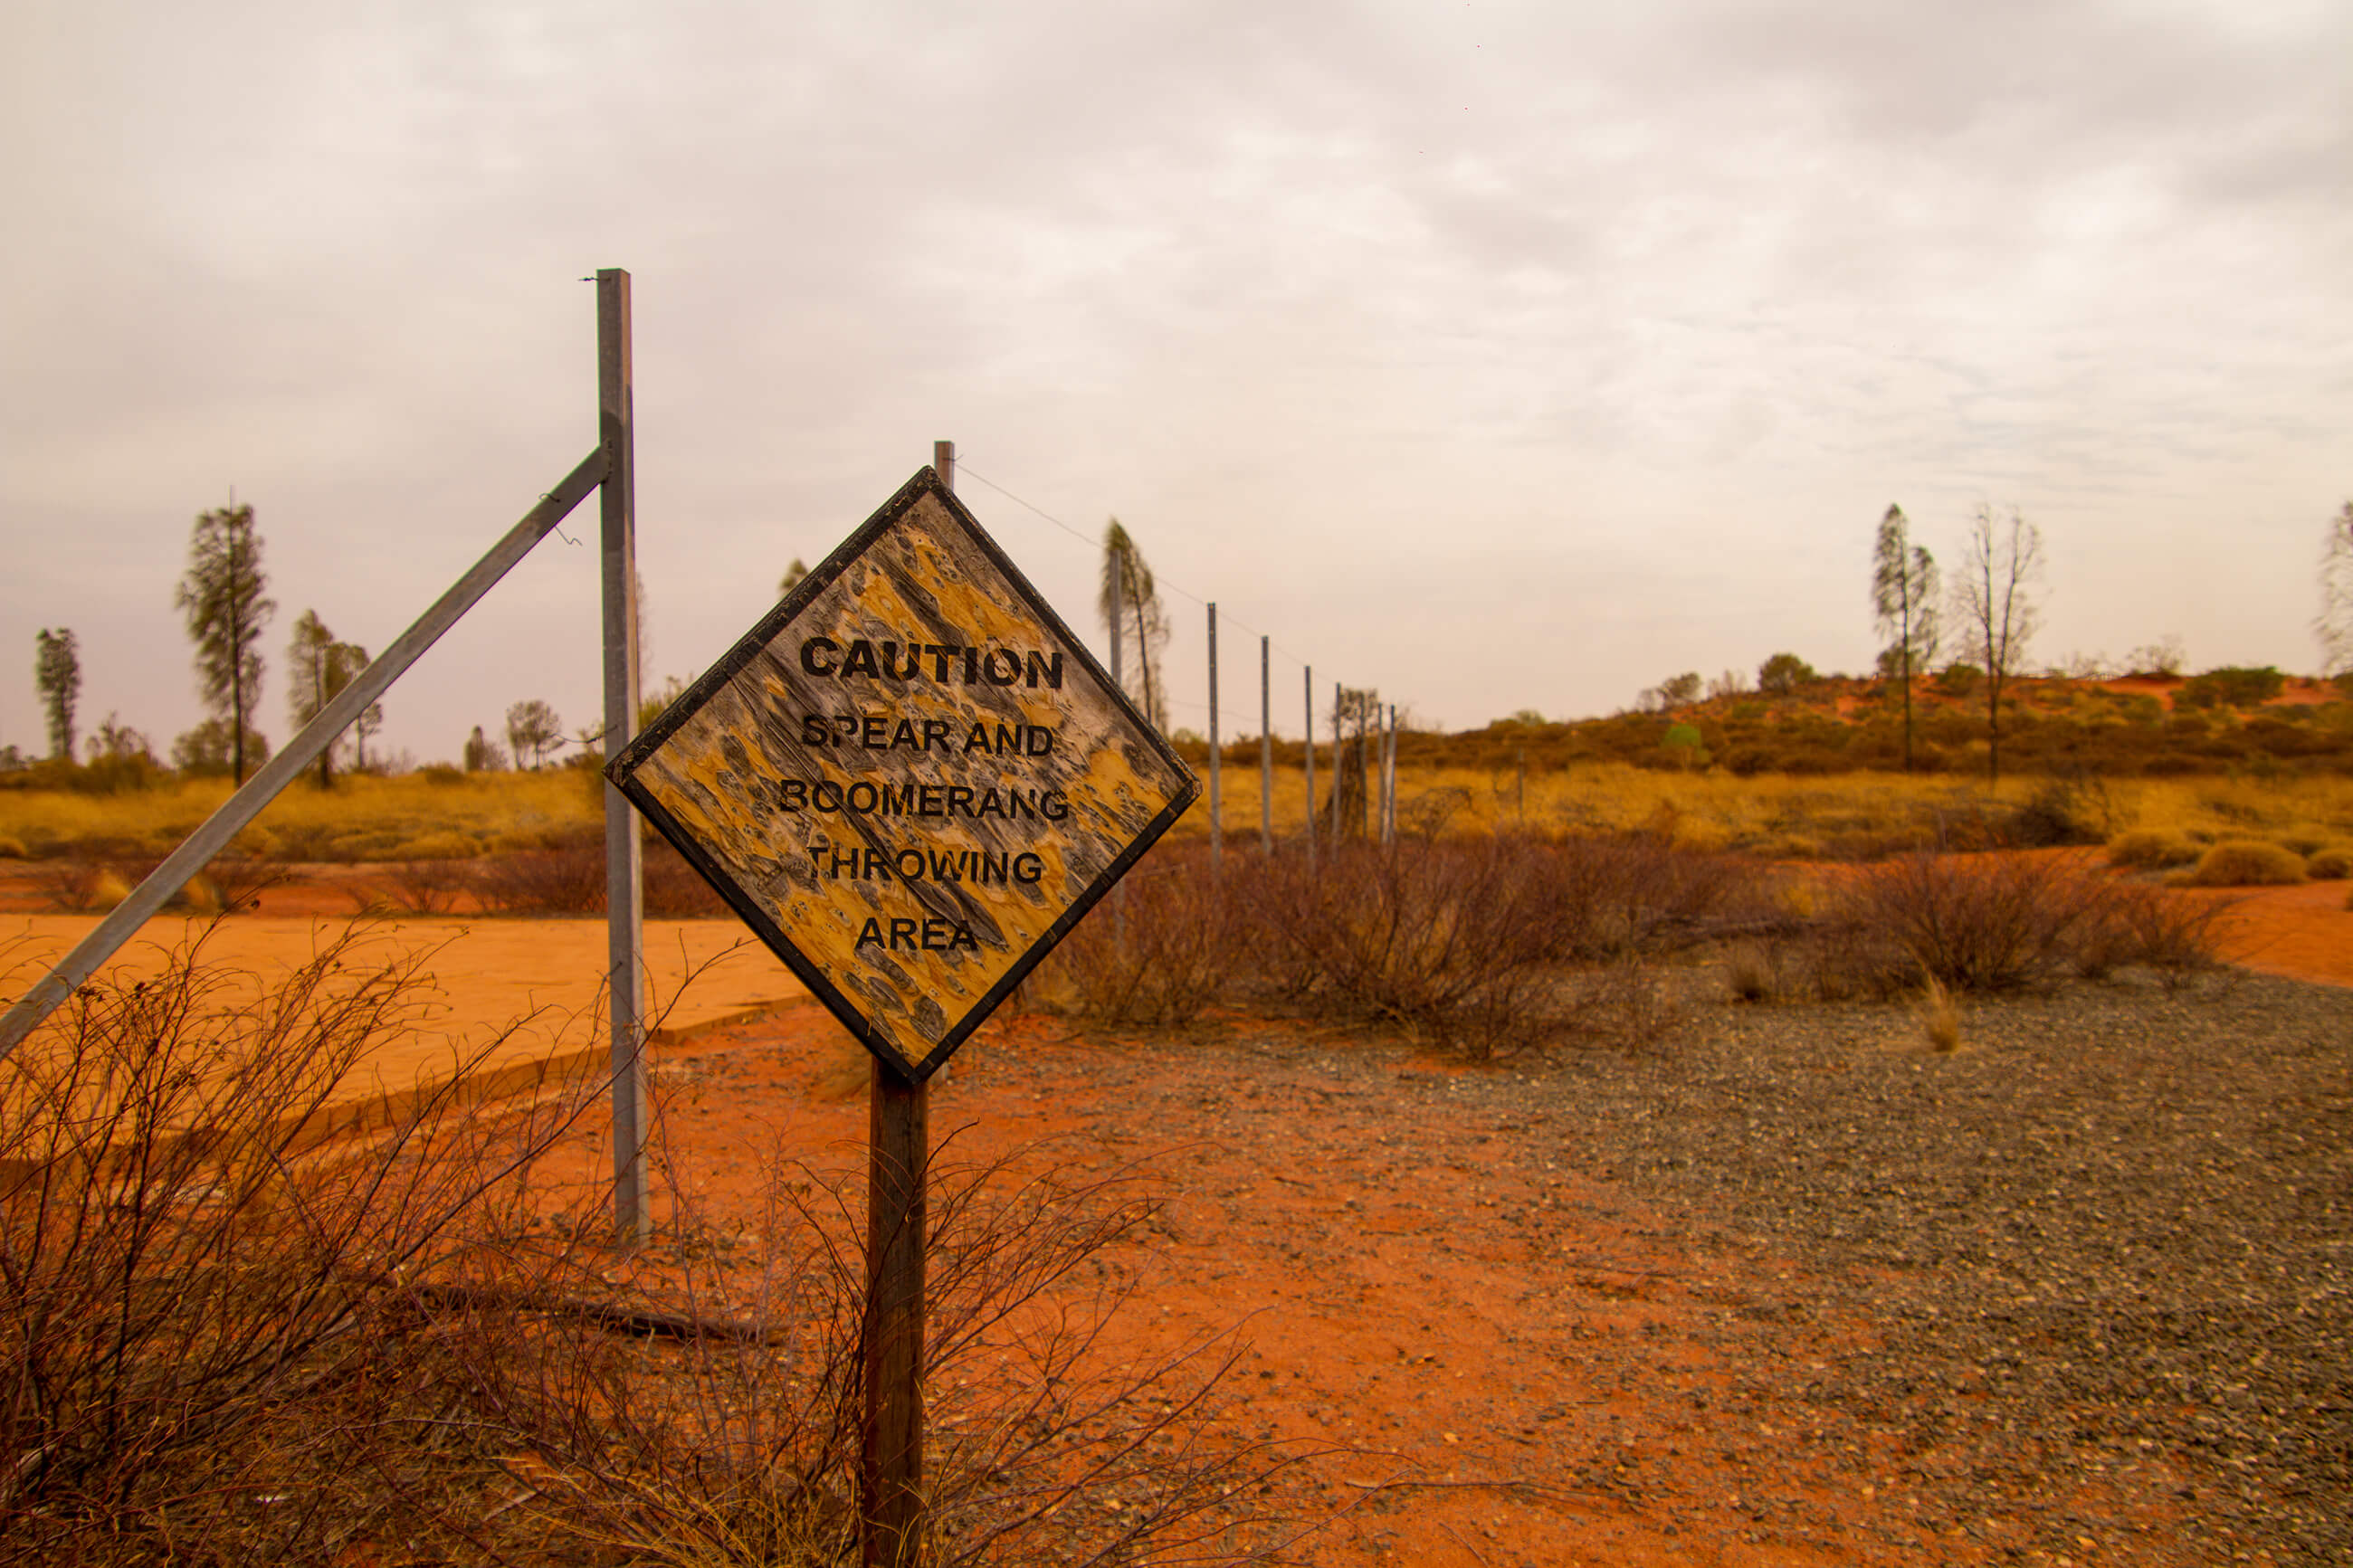 https://bubo.sk/uploads/galleries/5026/yulara---outback.jpg